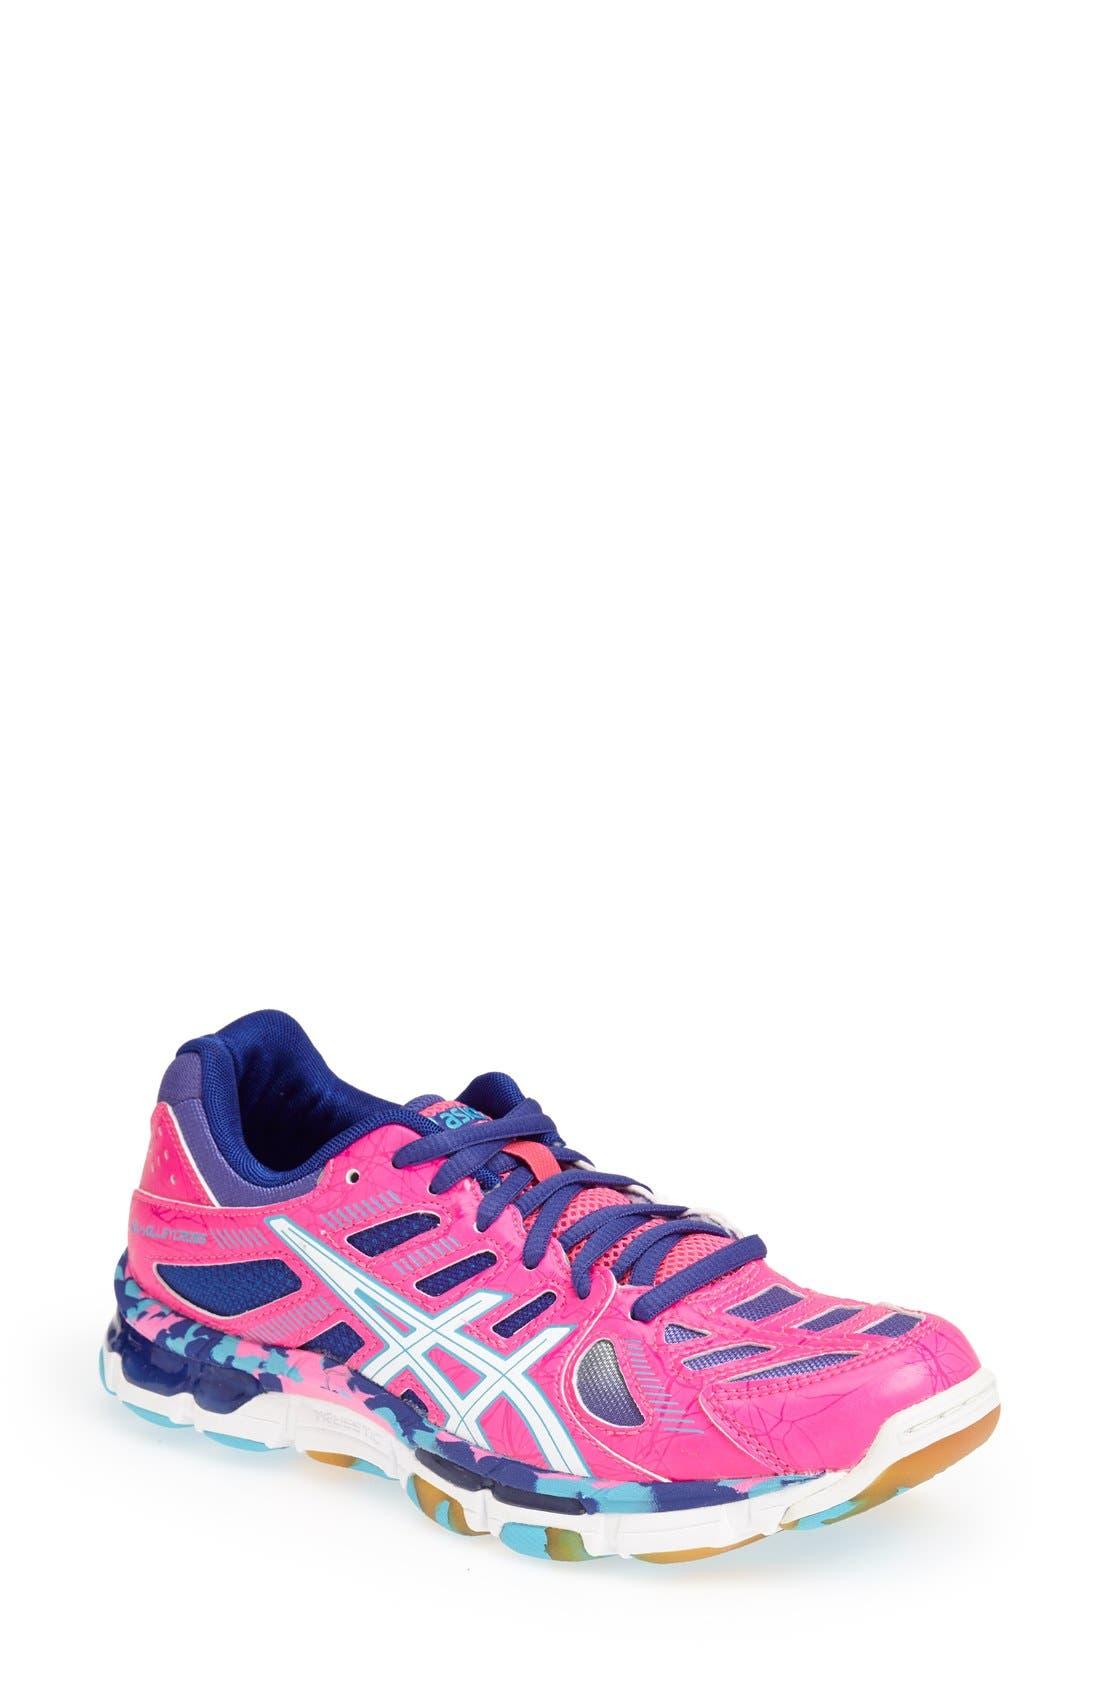 Alternate Image 1 Selected - ASICS® 'GEL-Volleycross® Revolution' Volleyball Shoe (Women) (Regular Retail Price: 109.95)